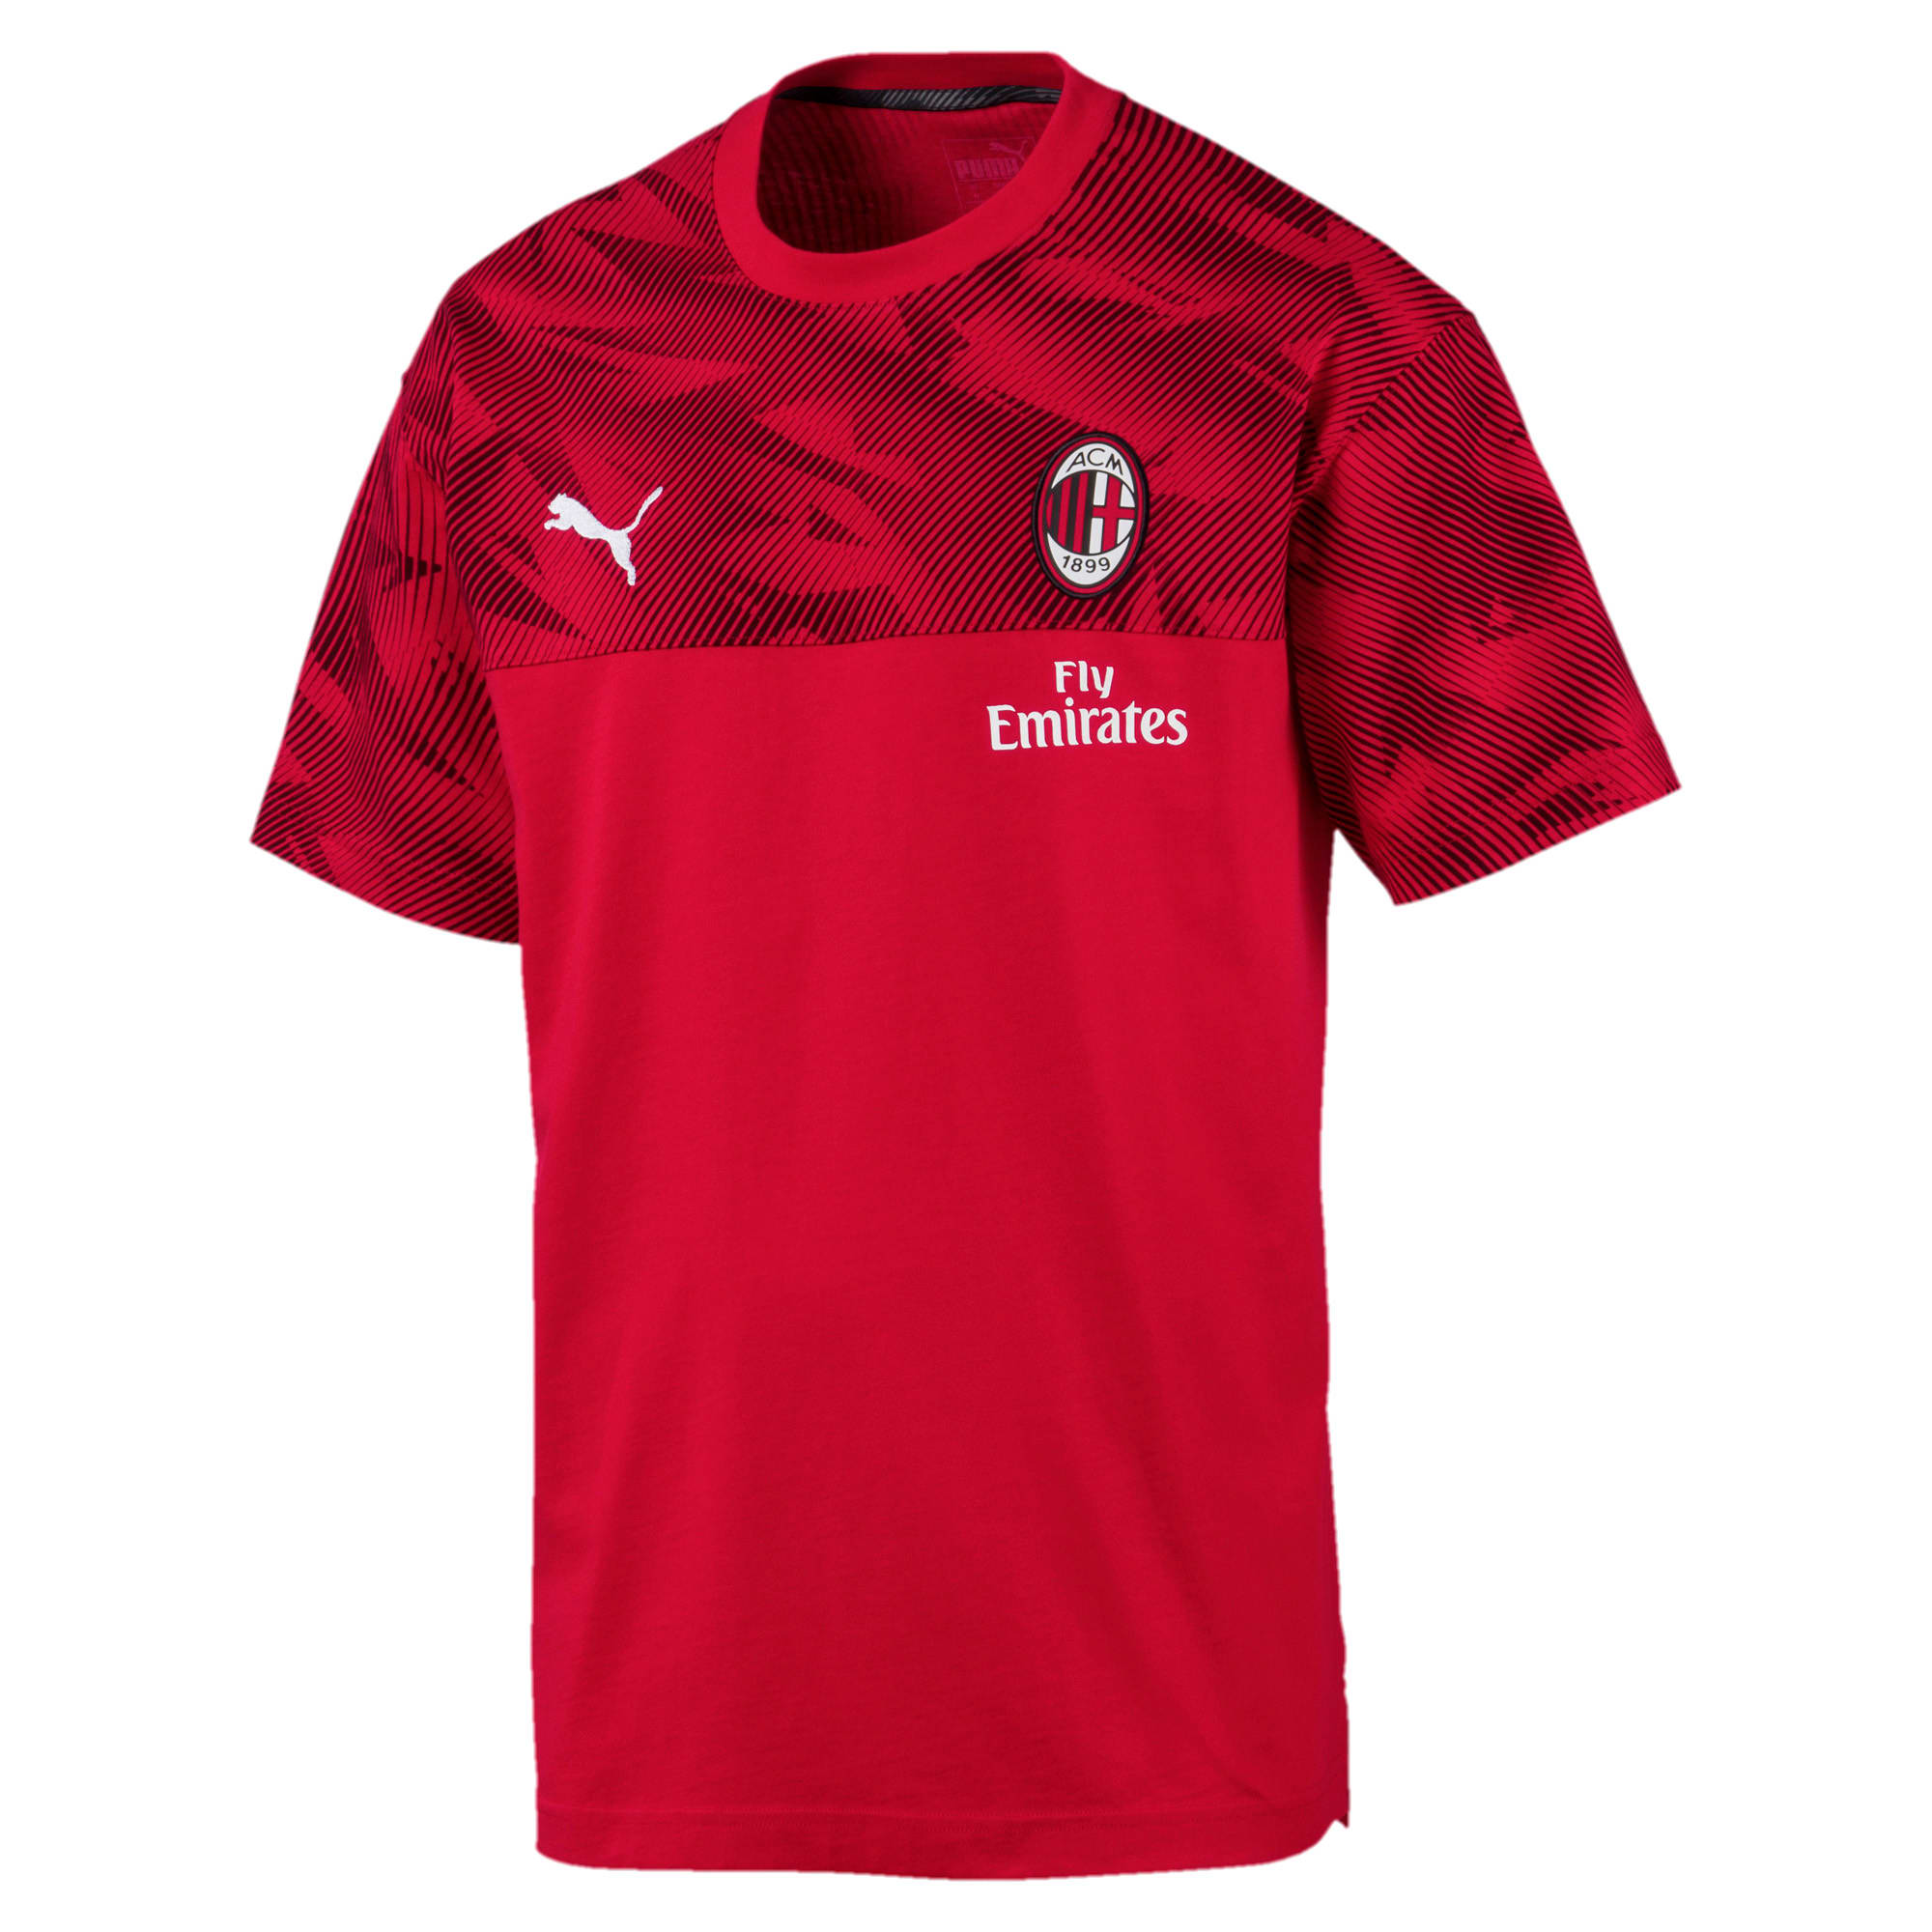 Thumbnail 4 of AC Milan Casuals Men's Tee, Tango Red -Puma Black, medium